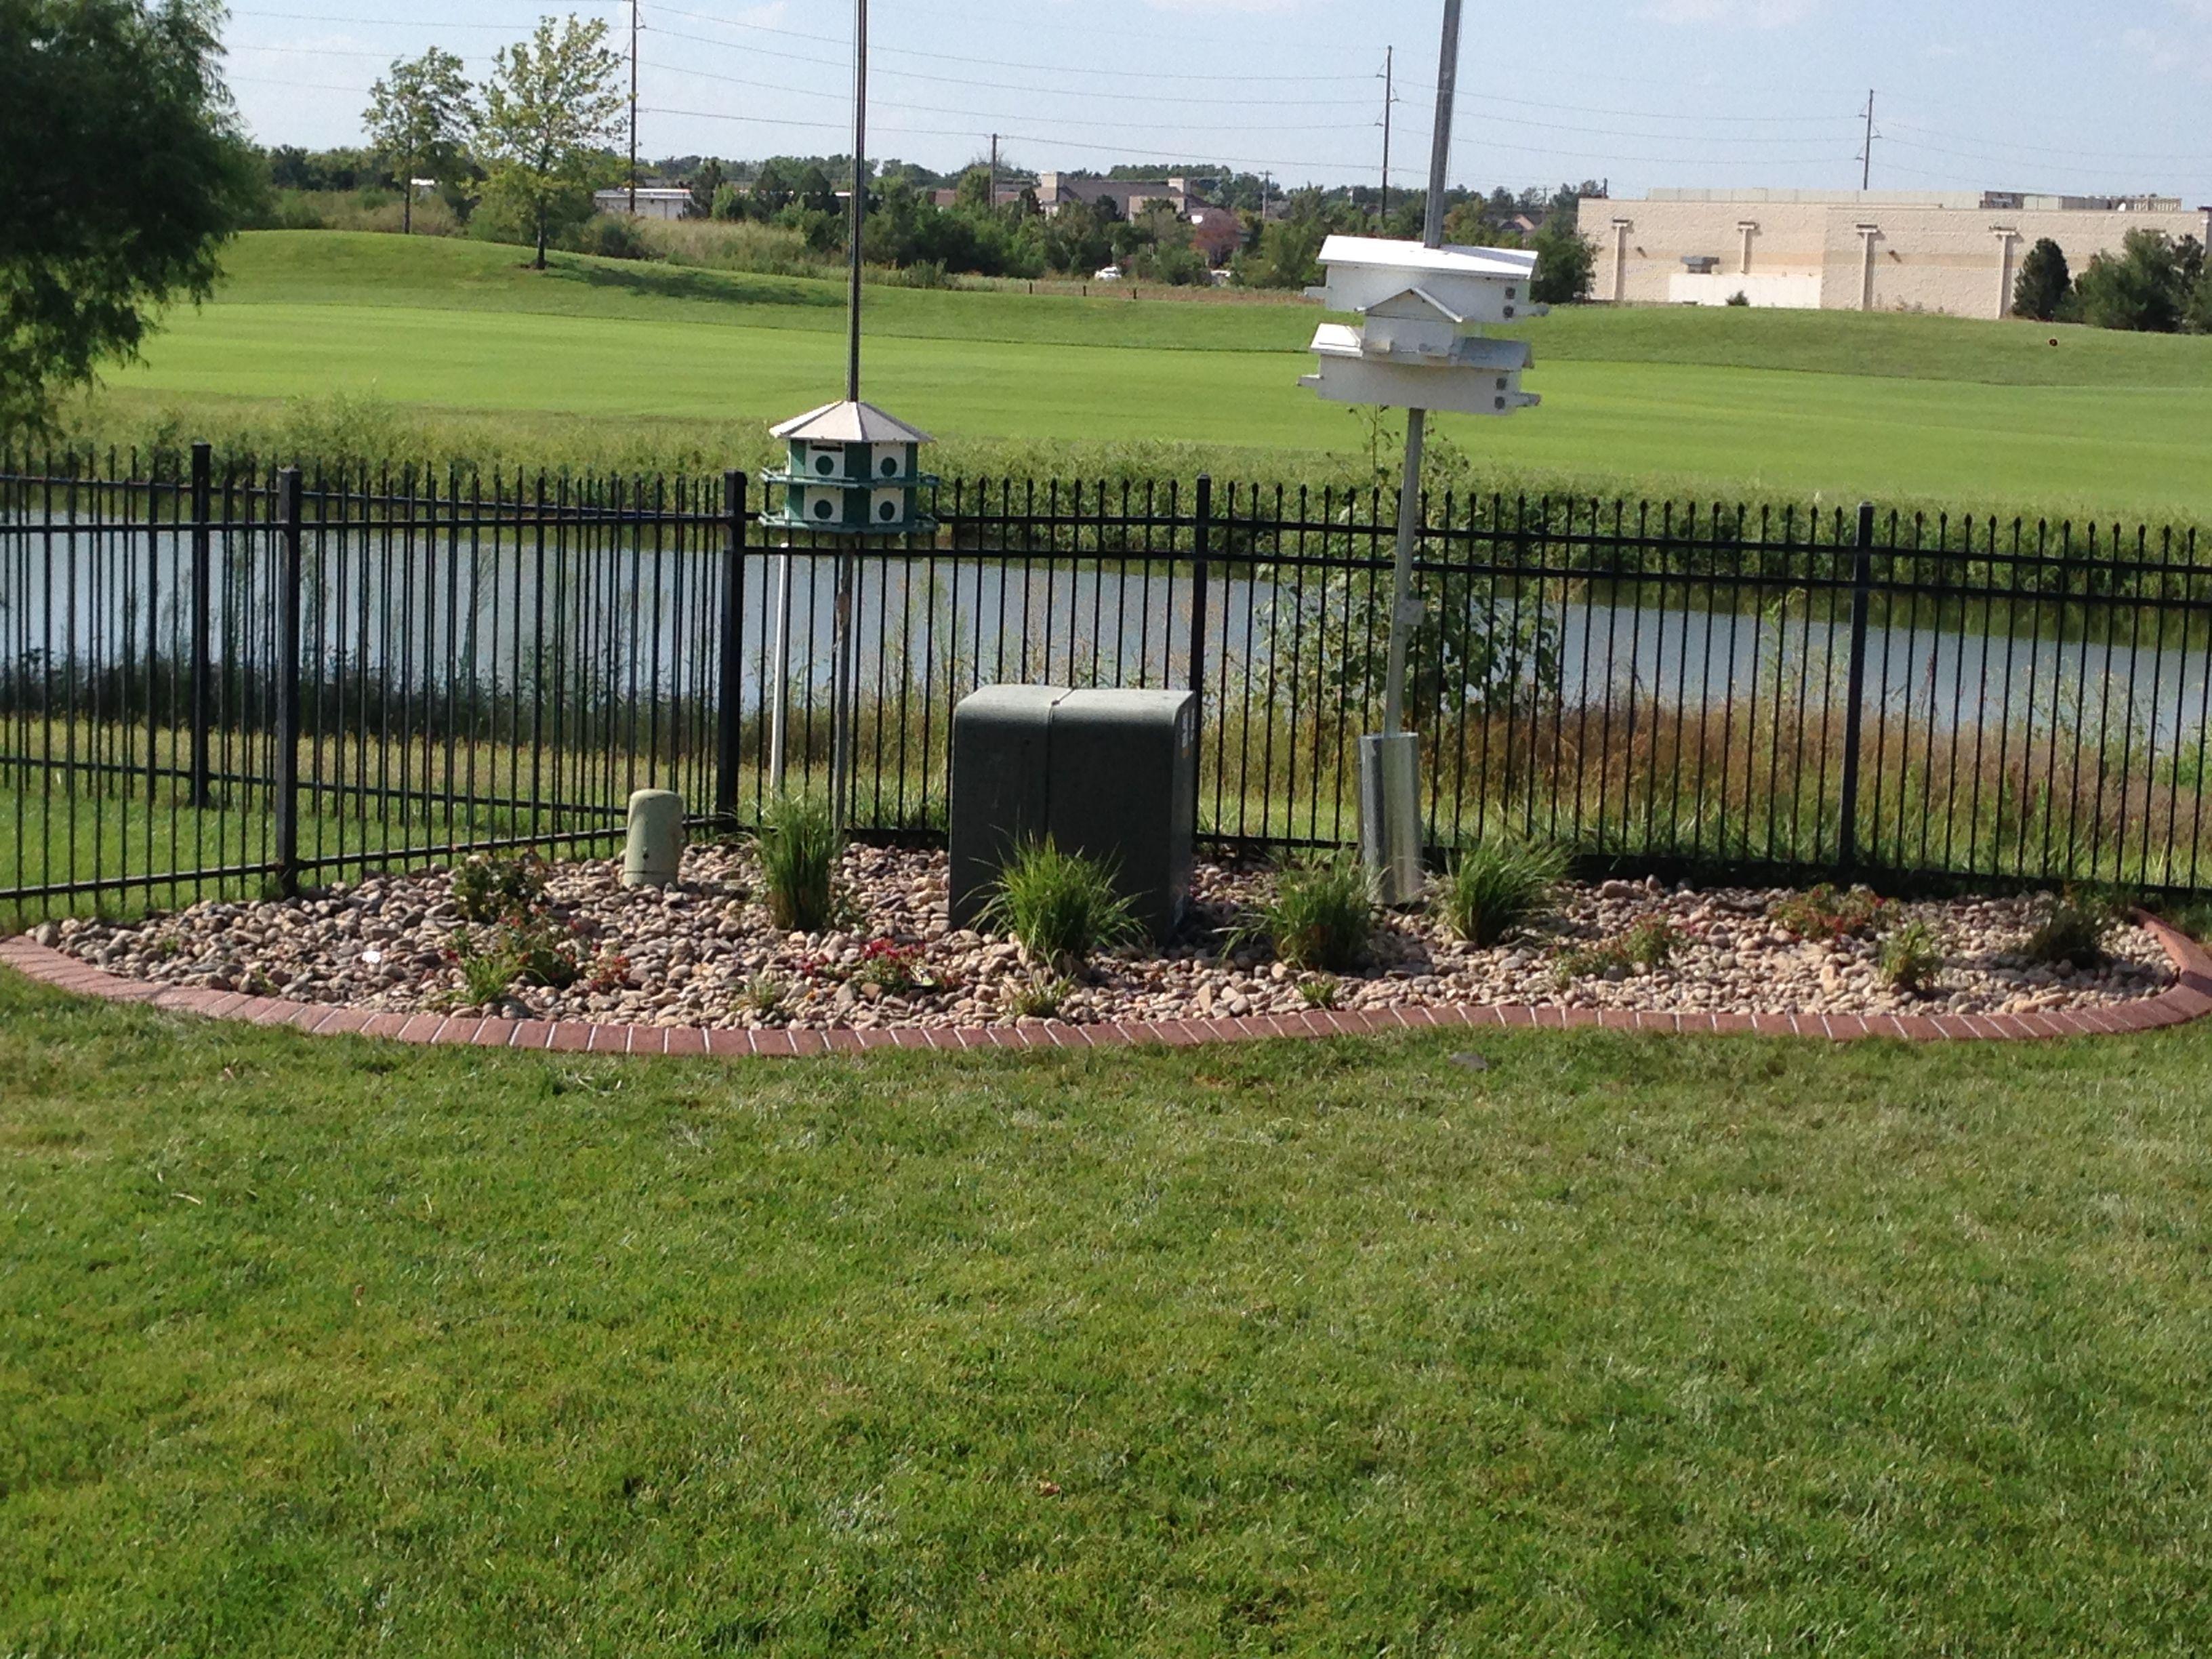 Wichita Landscaping Landscape Design Services Landscape Design